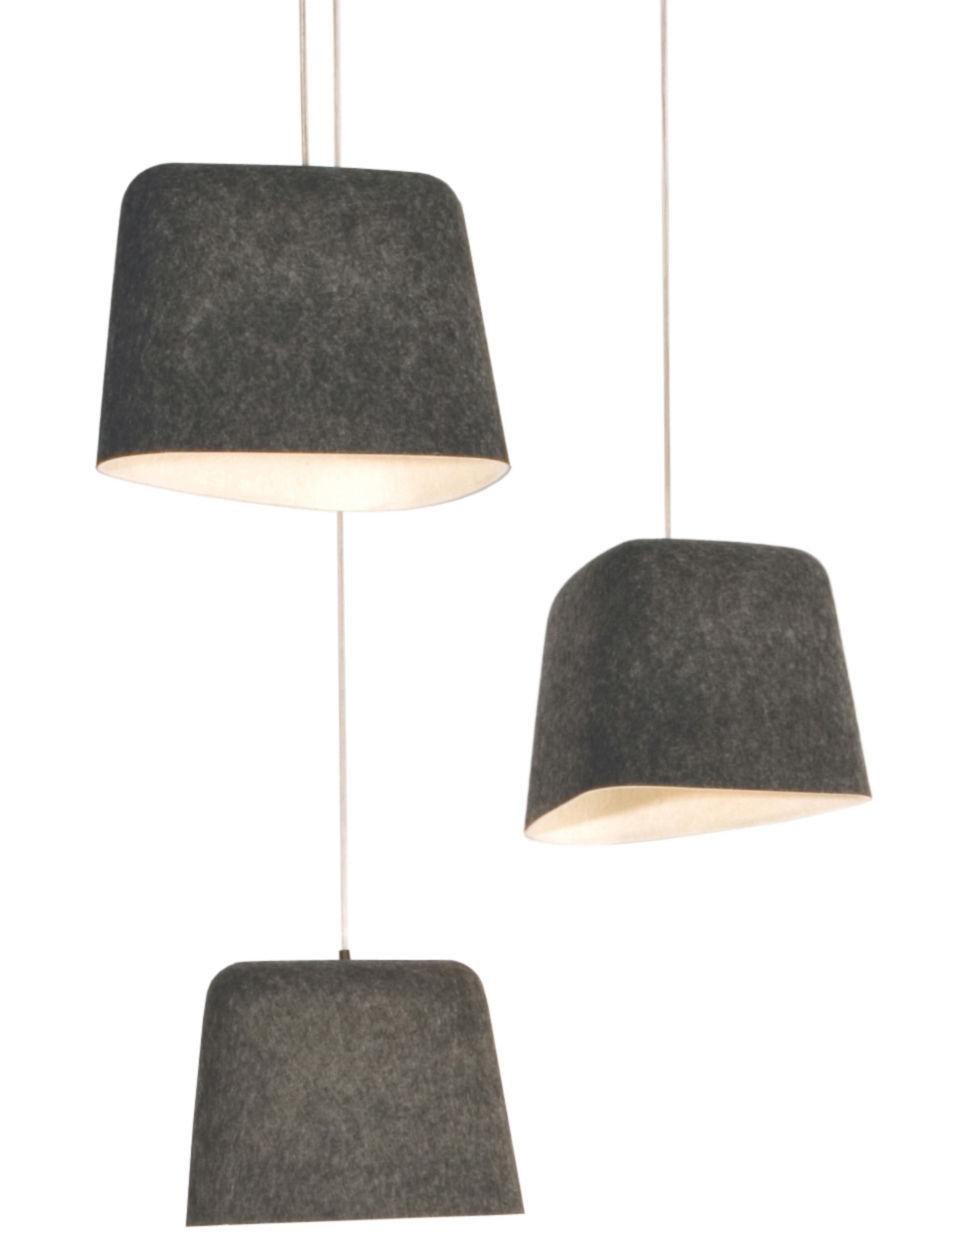 Lighting - Pendant Lighting - Felt Shade Pendant by Tom Dixon - Grey - Felt